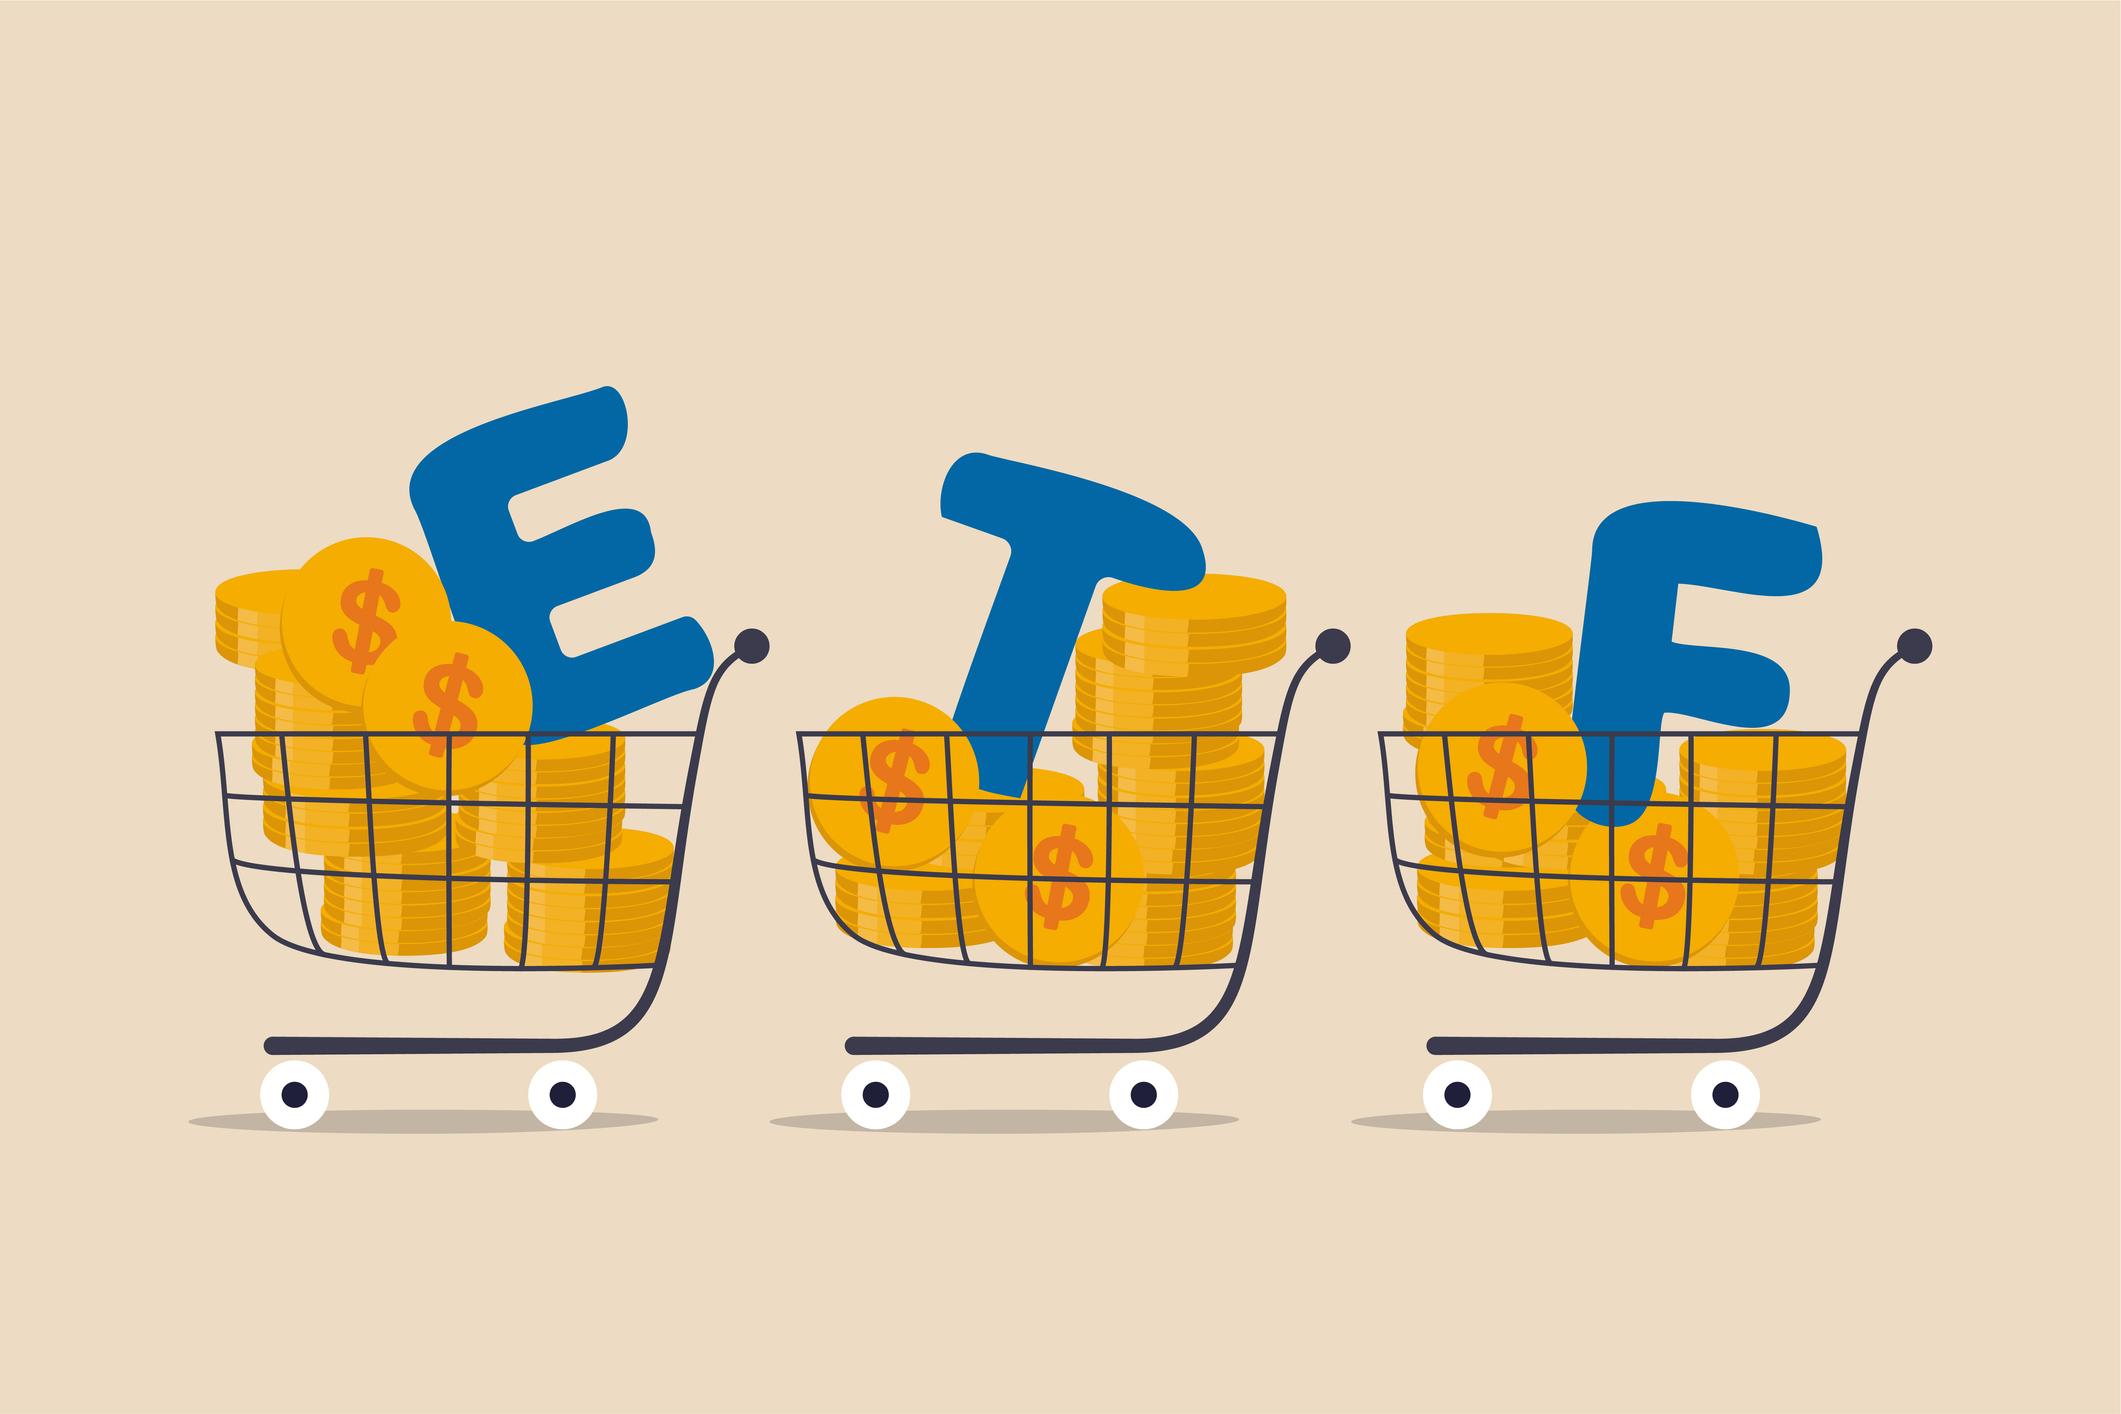 The 2 Best ETFs for Dividends